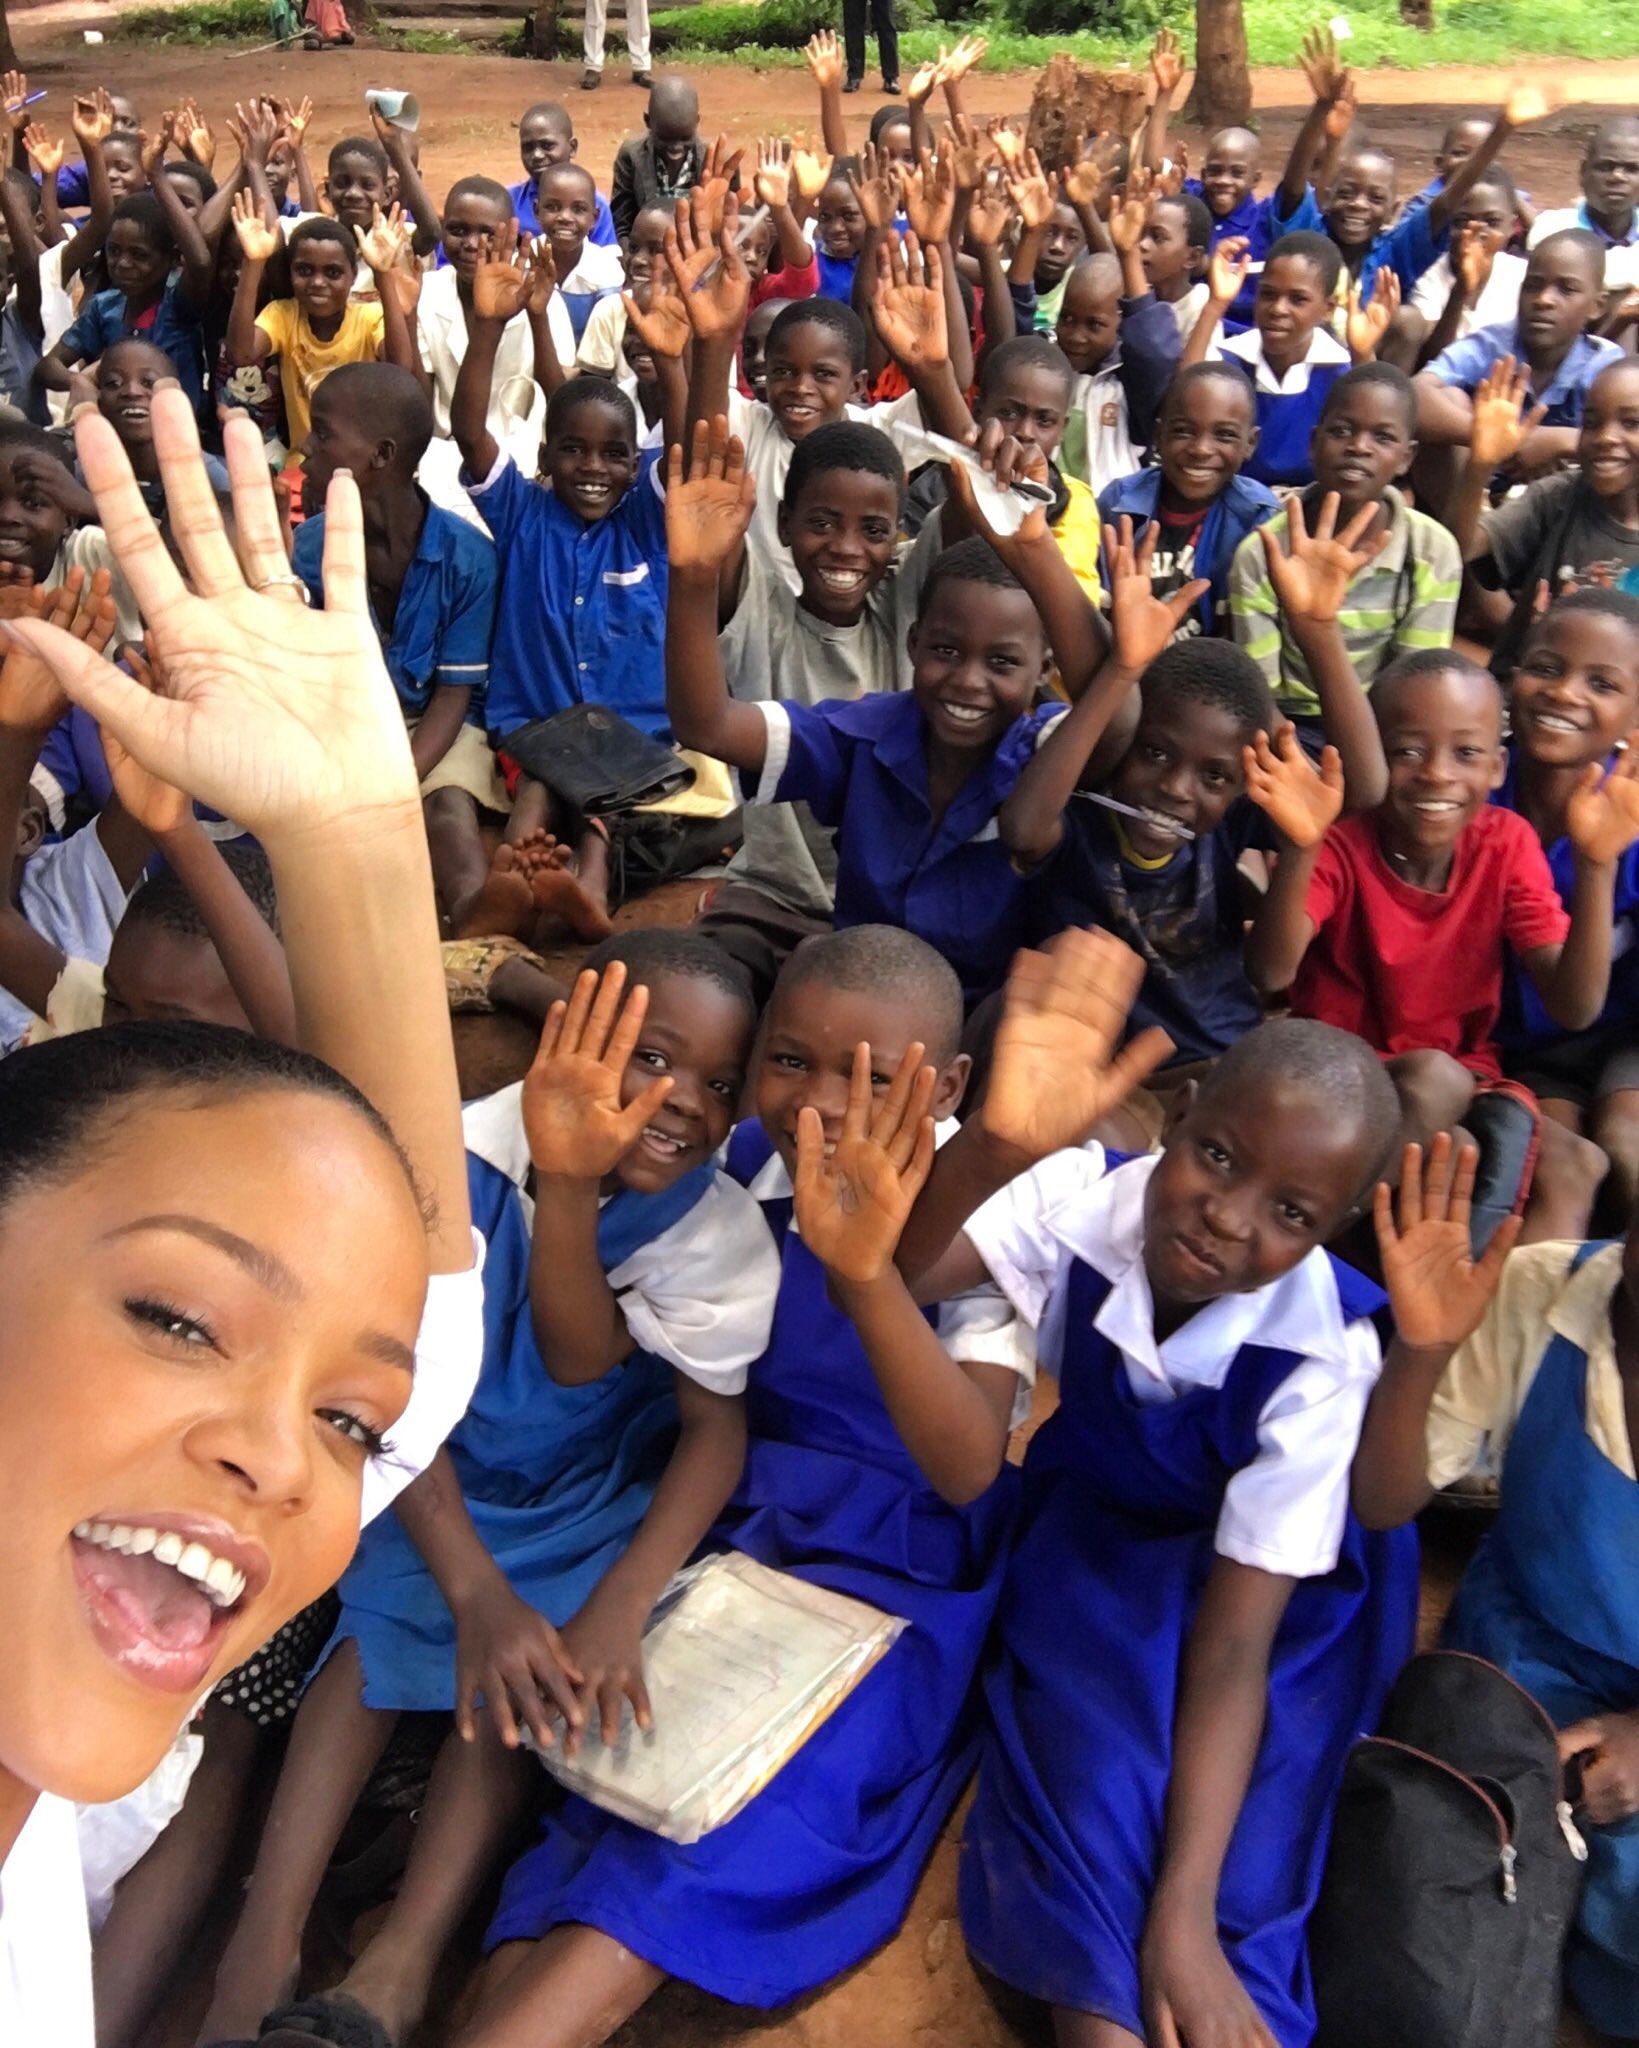 Rihanna with the kids